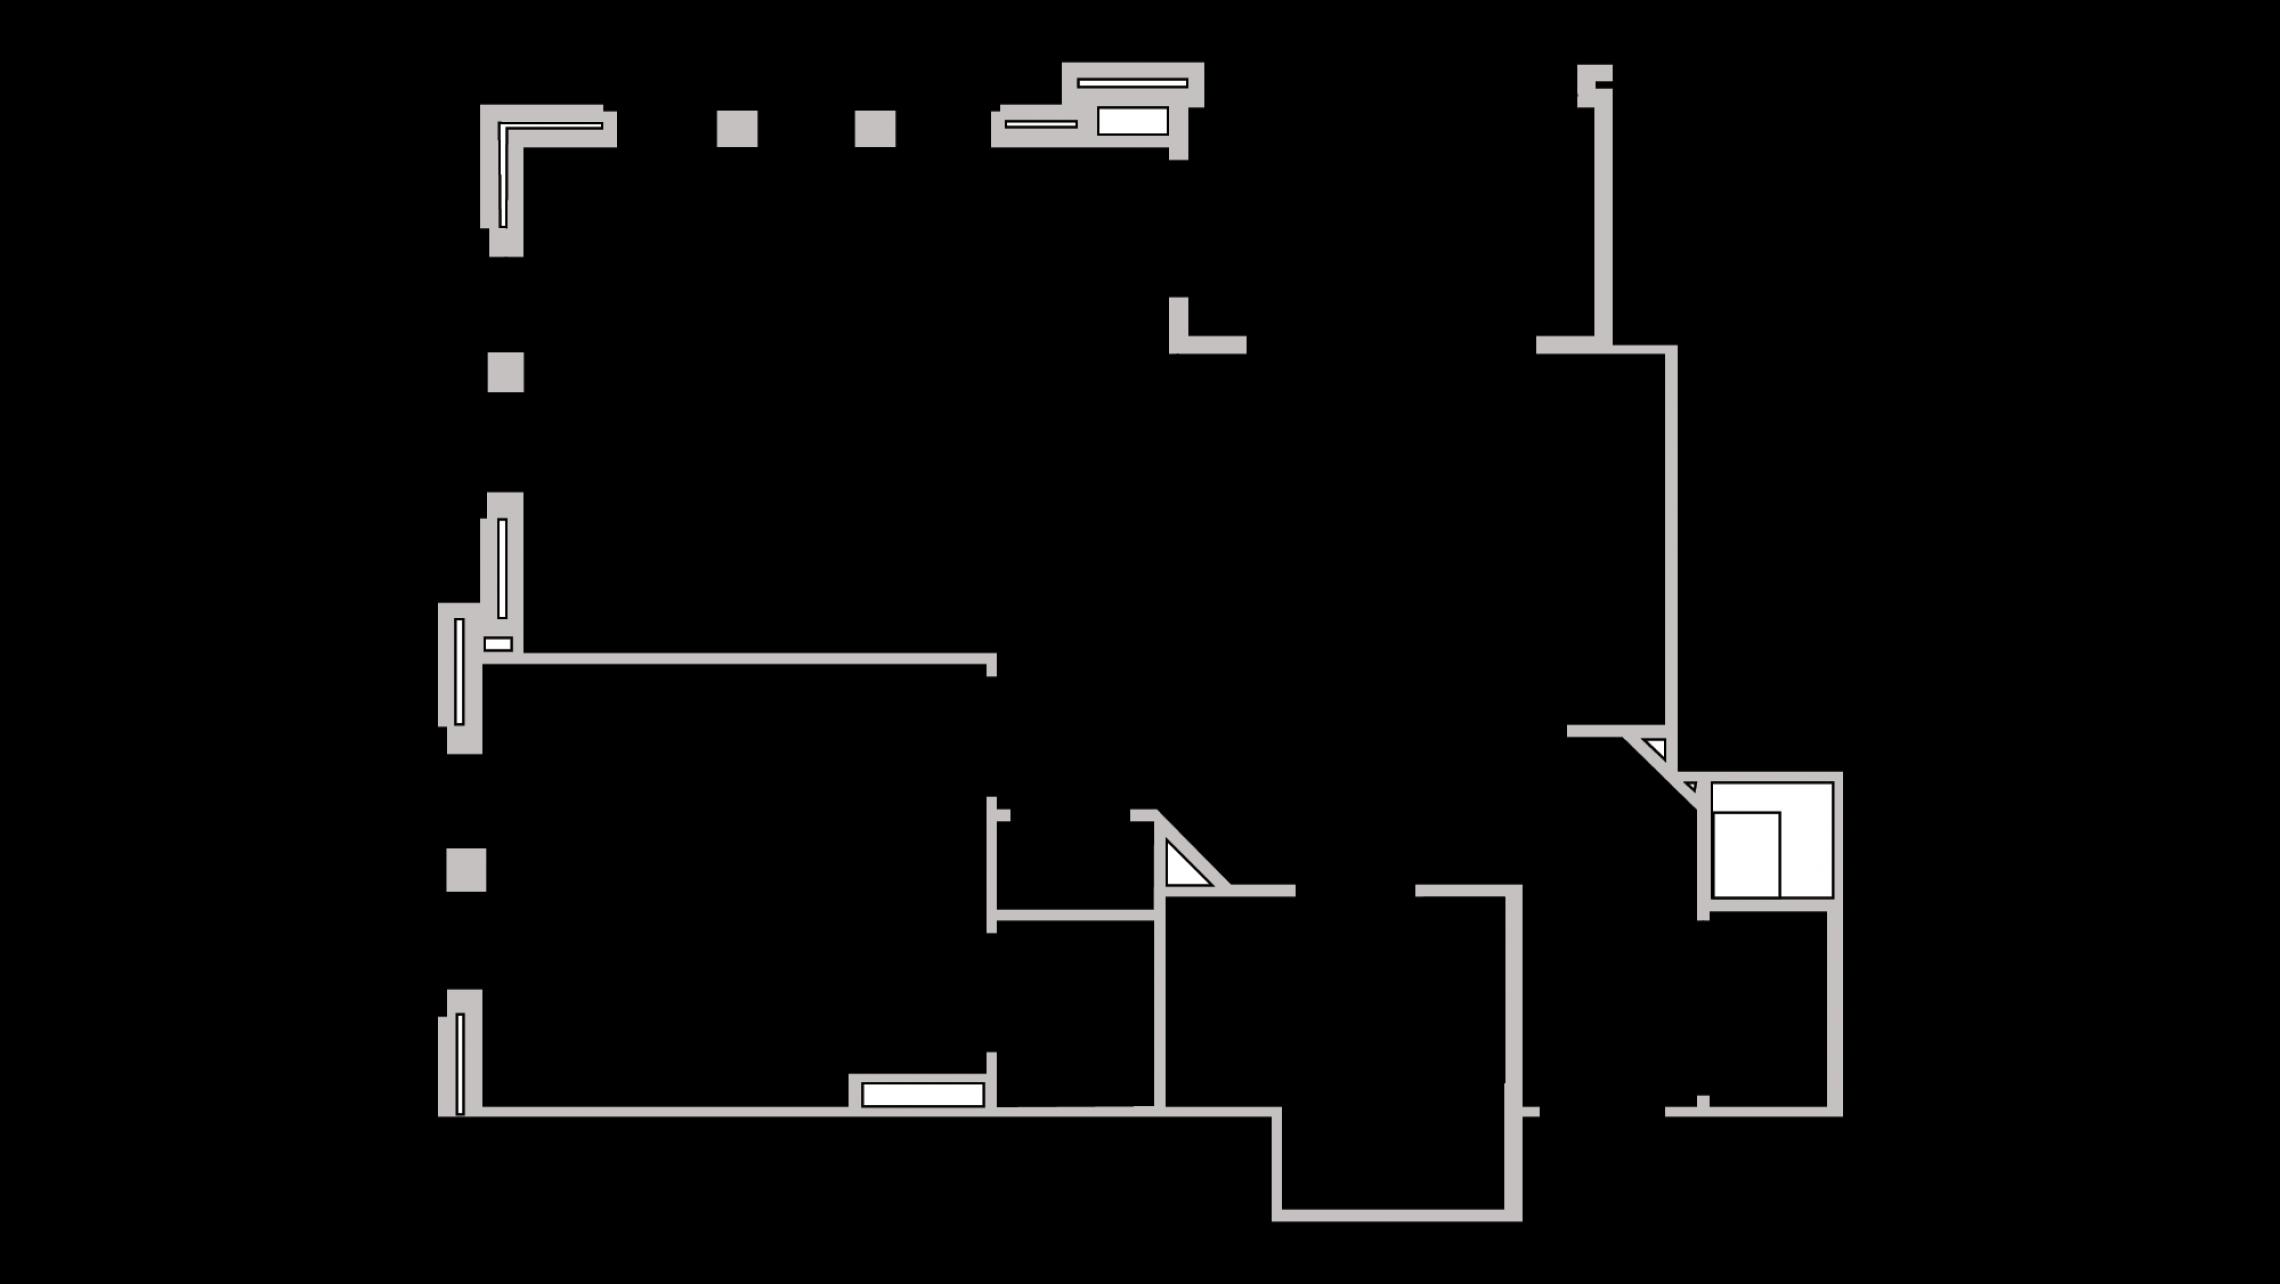 ULI The Depot 1-407 - One Bedroom, One Bathroom